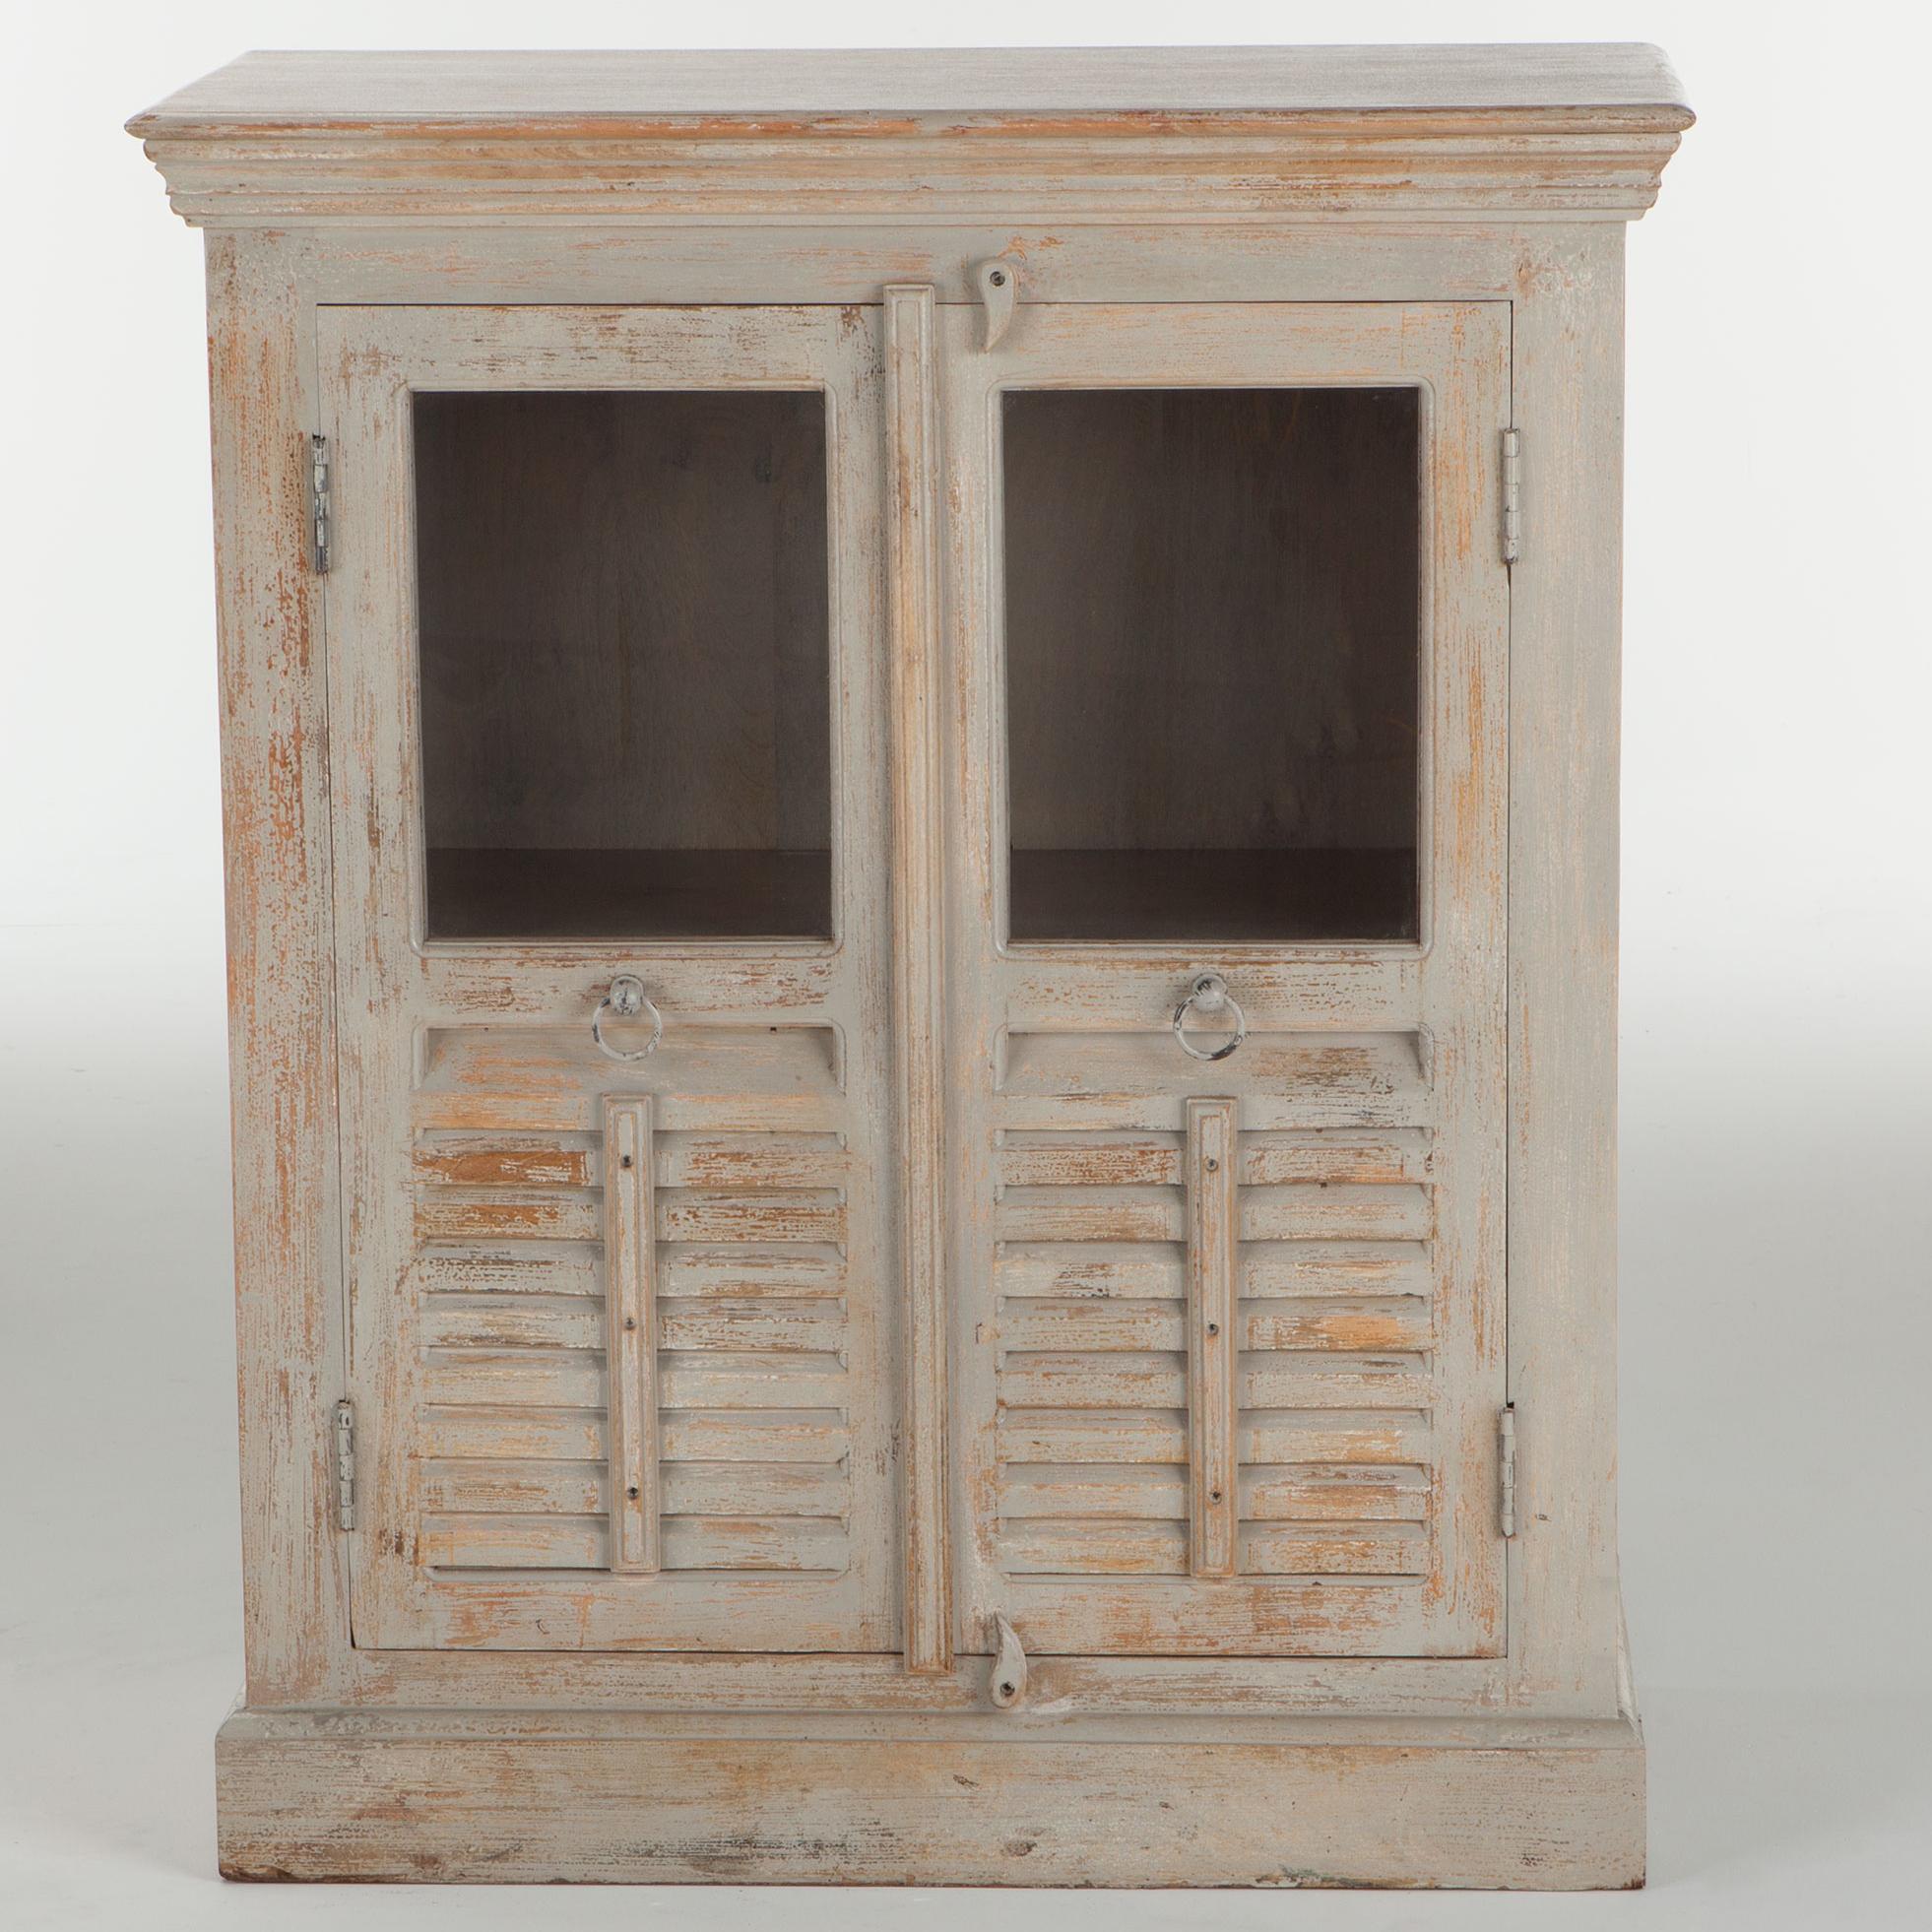 BeGlobal FGO Occasional Cabinet - Item Number: FGO-SGC35LG